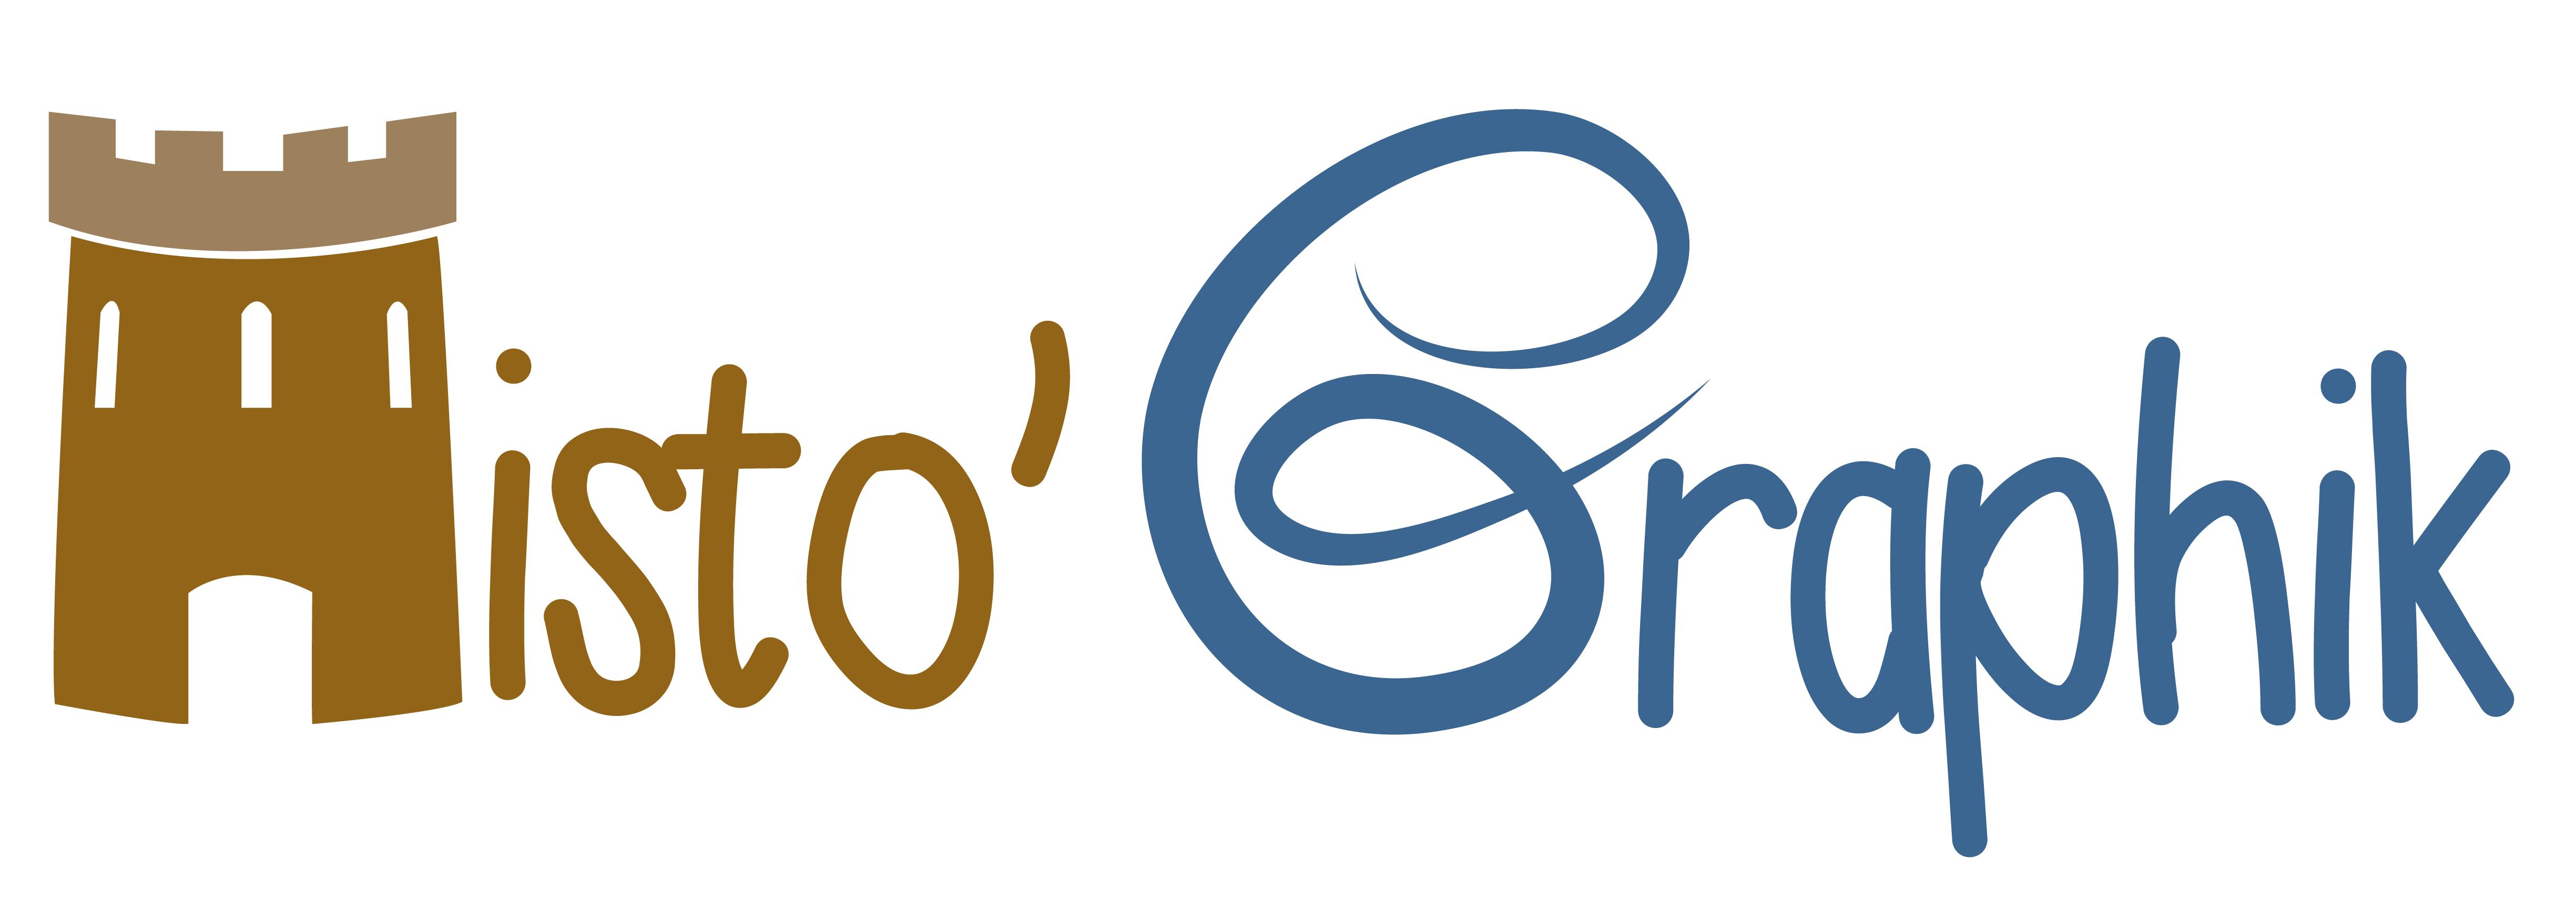 Logo histographik Mélanie Robeau